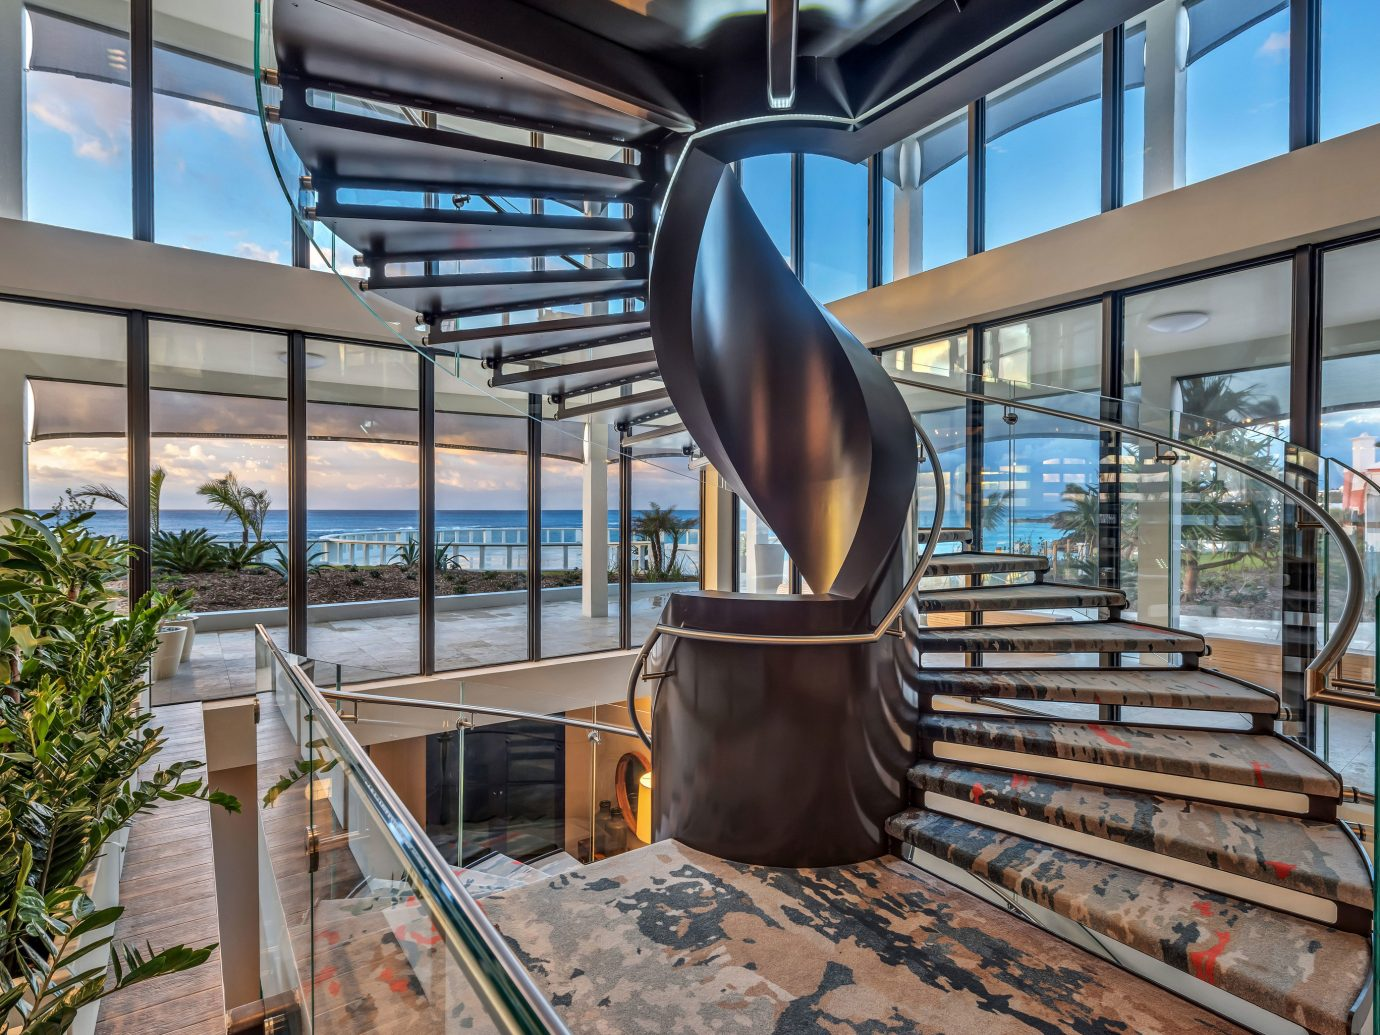 Hotels Offbeat Romance Trip Ideas indoor building Architecture estate home interior design facade stairs tourist attraction furniture